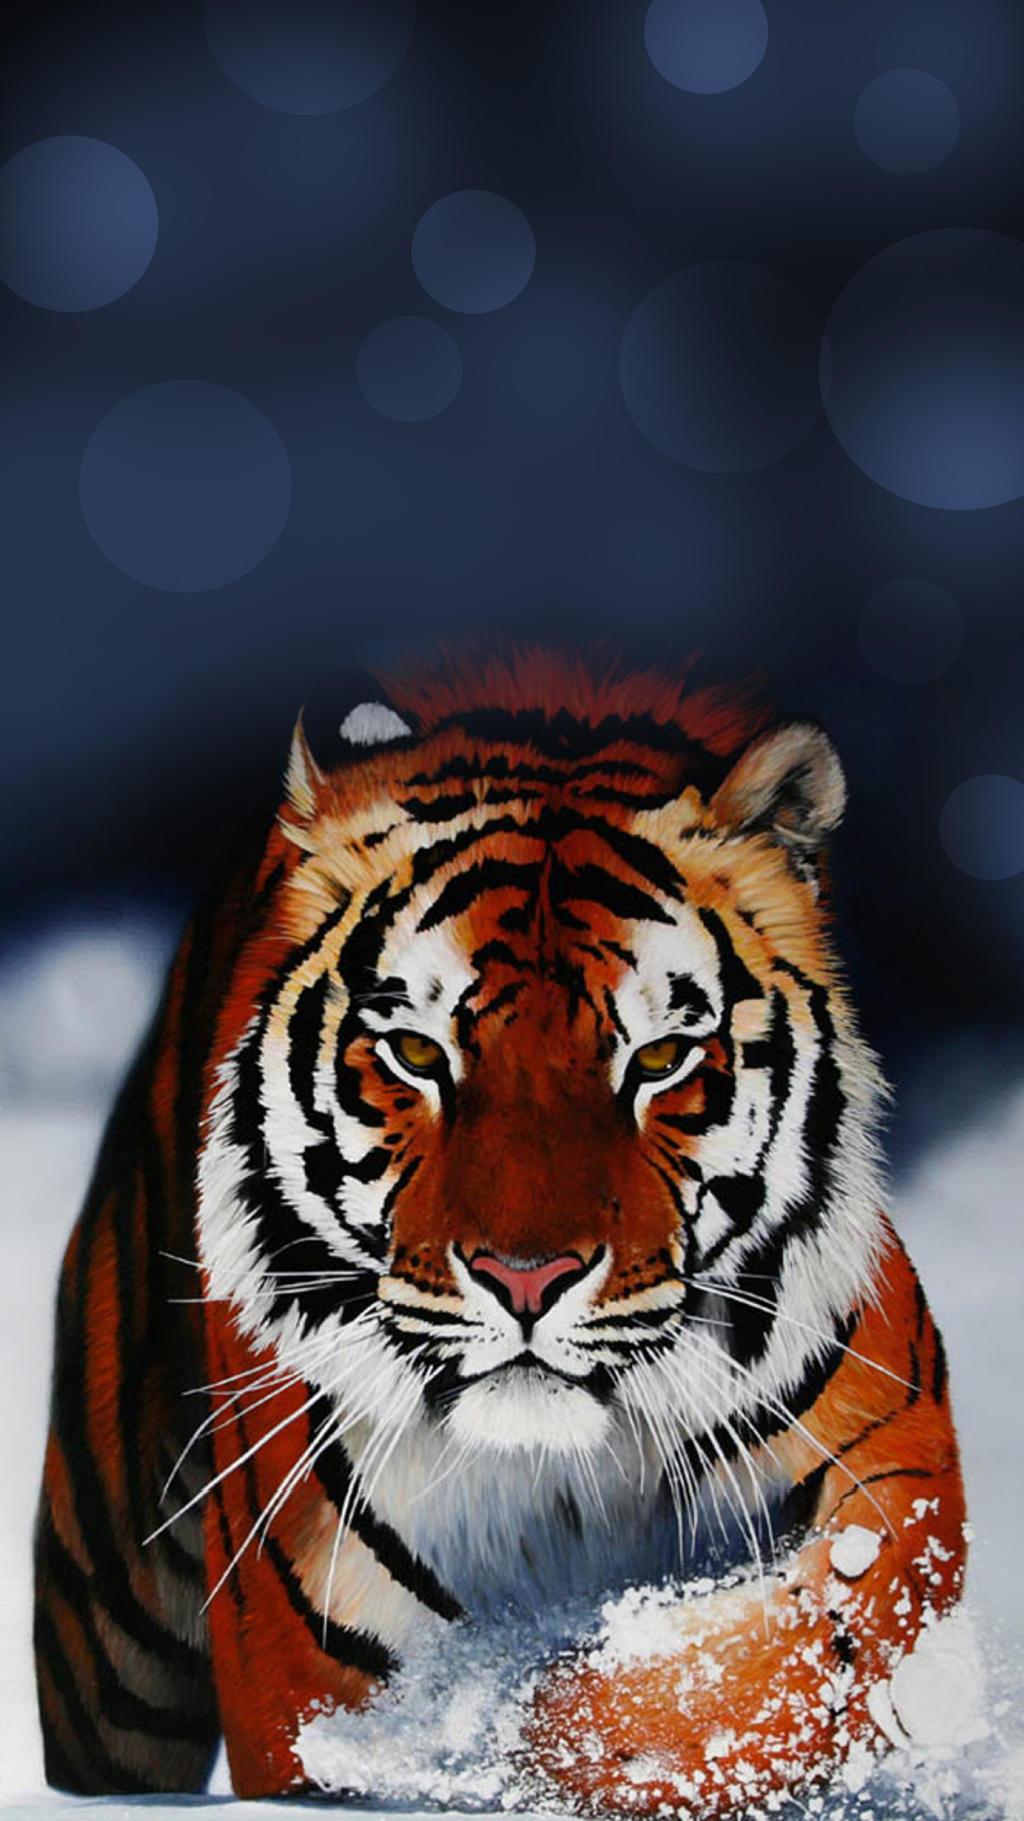 Tiger Wallpaper Iphone 6s Plus By Deviantsith17 On Deviantart